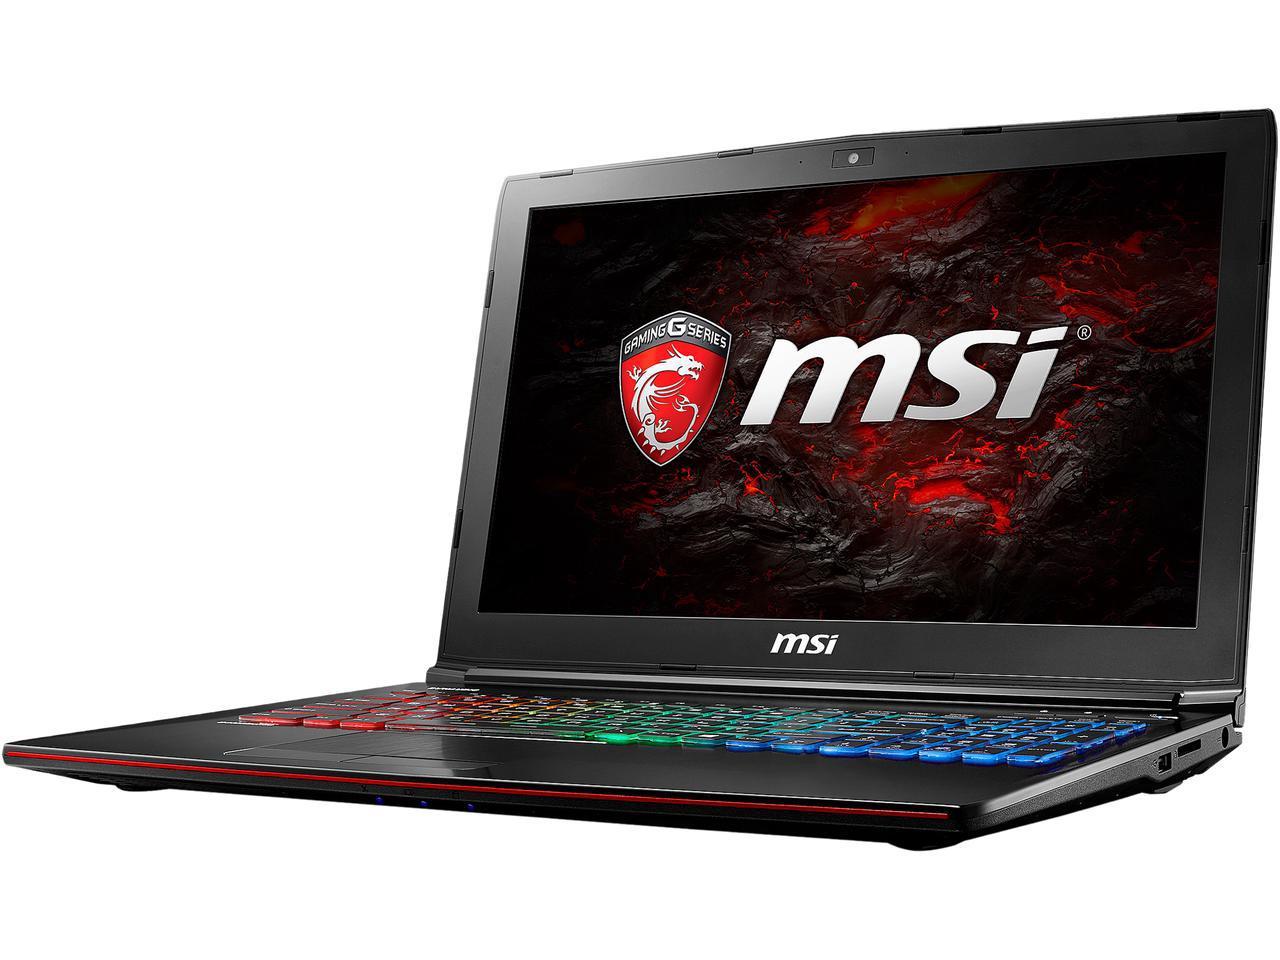 MSI GE62MVR Apache Pro-041: 15.6'' FHD IPS, i7-7700HQ, 16GB DDR4. 128GB SSD, 1TB HDD, GTX 1070, Type-C, Win10H @ $1299 AR + F/S $1299